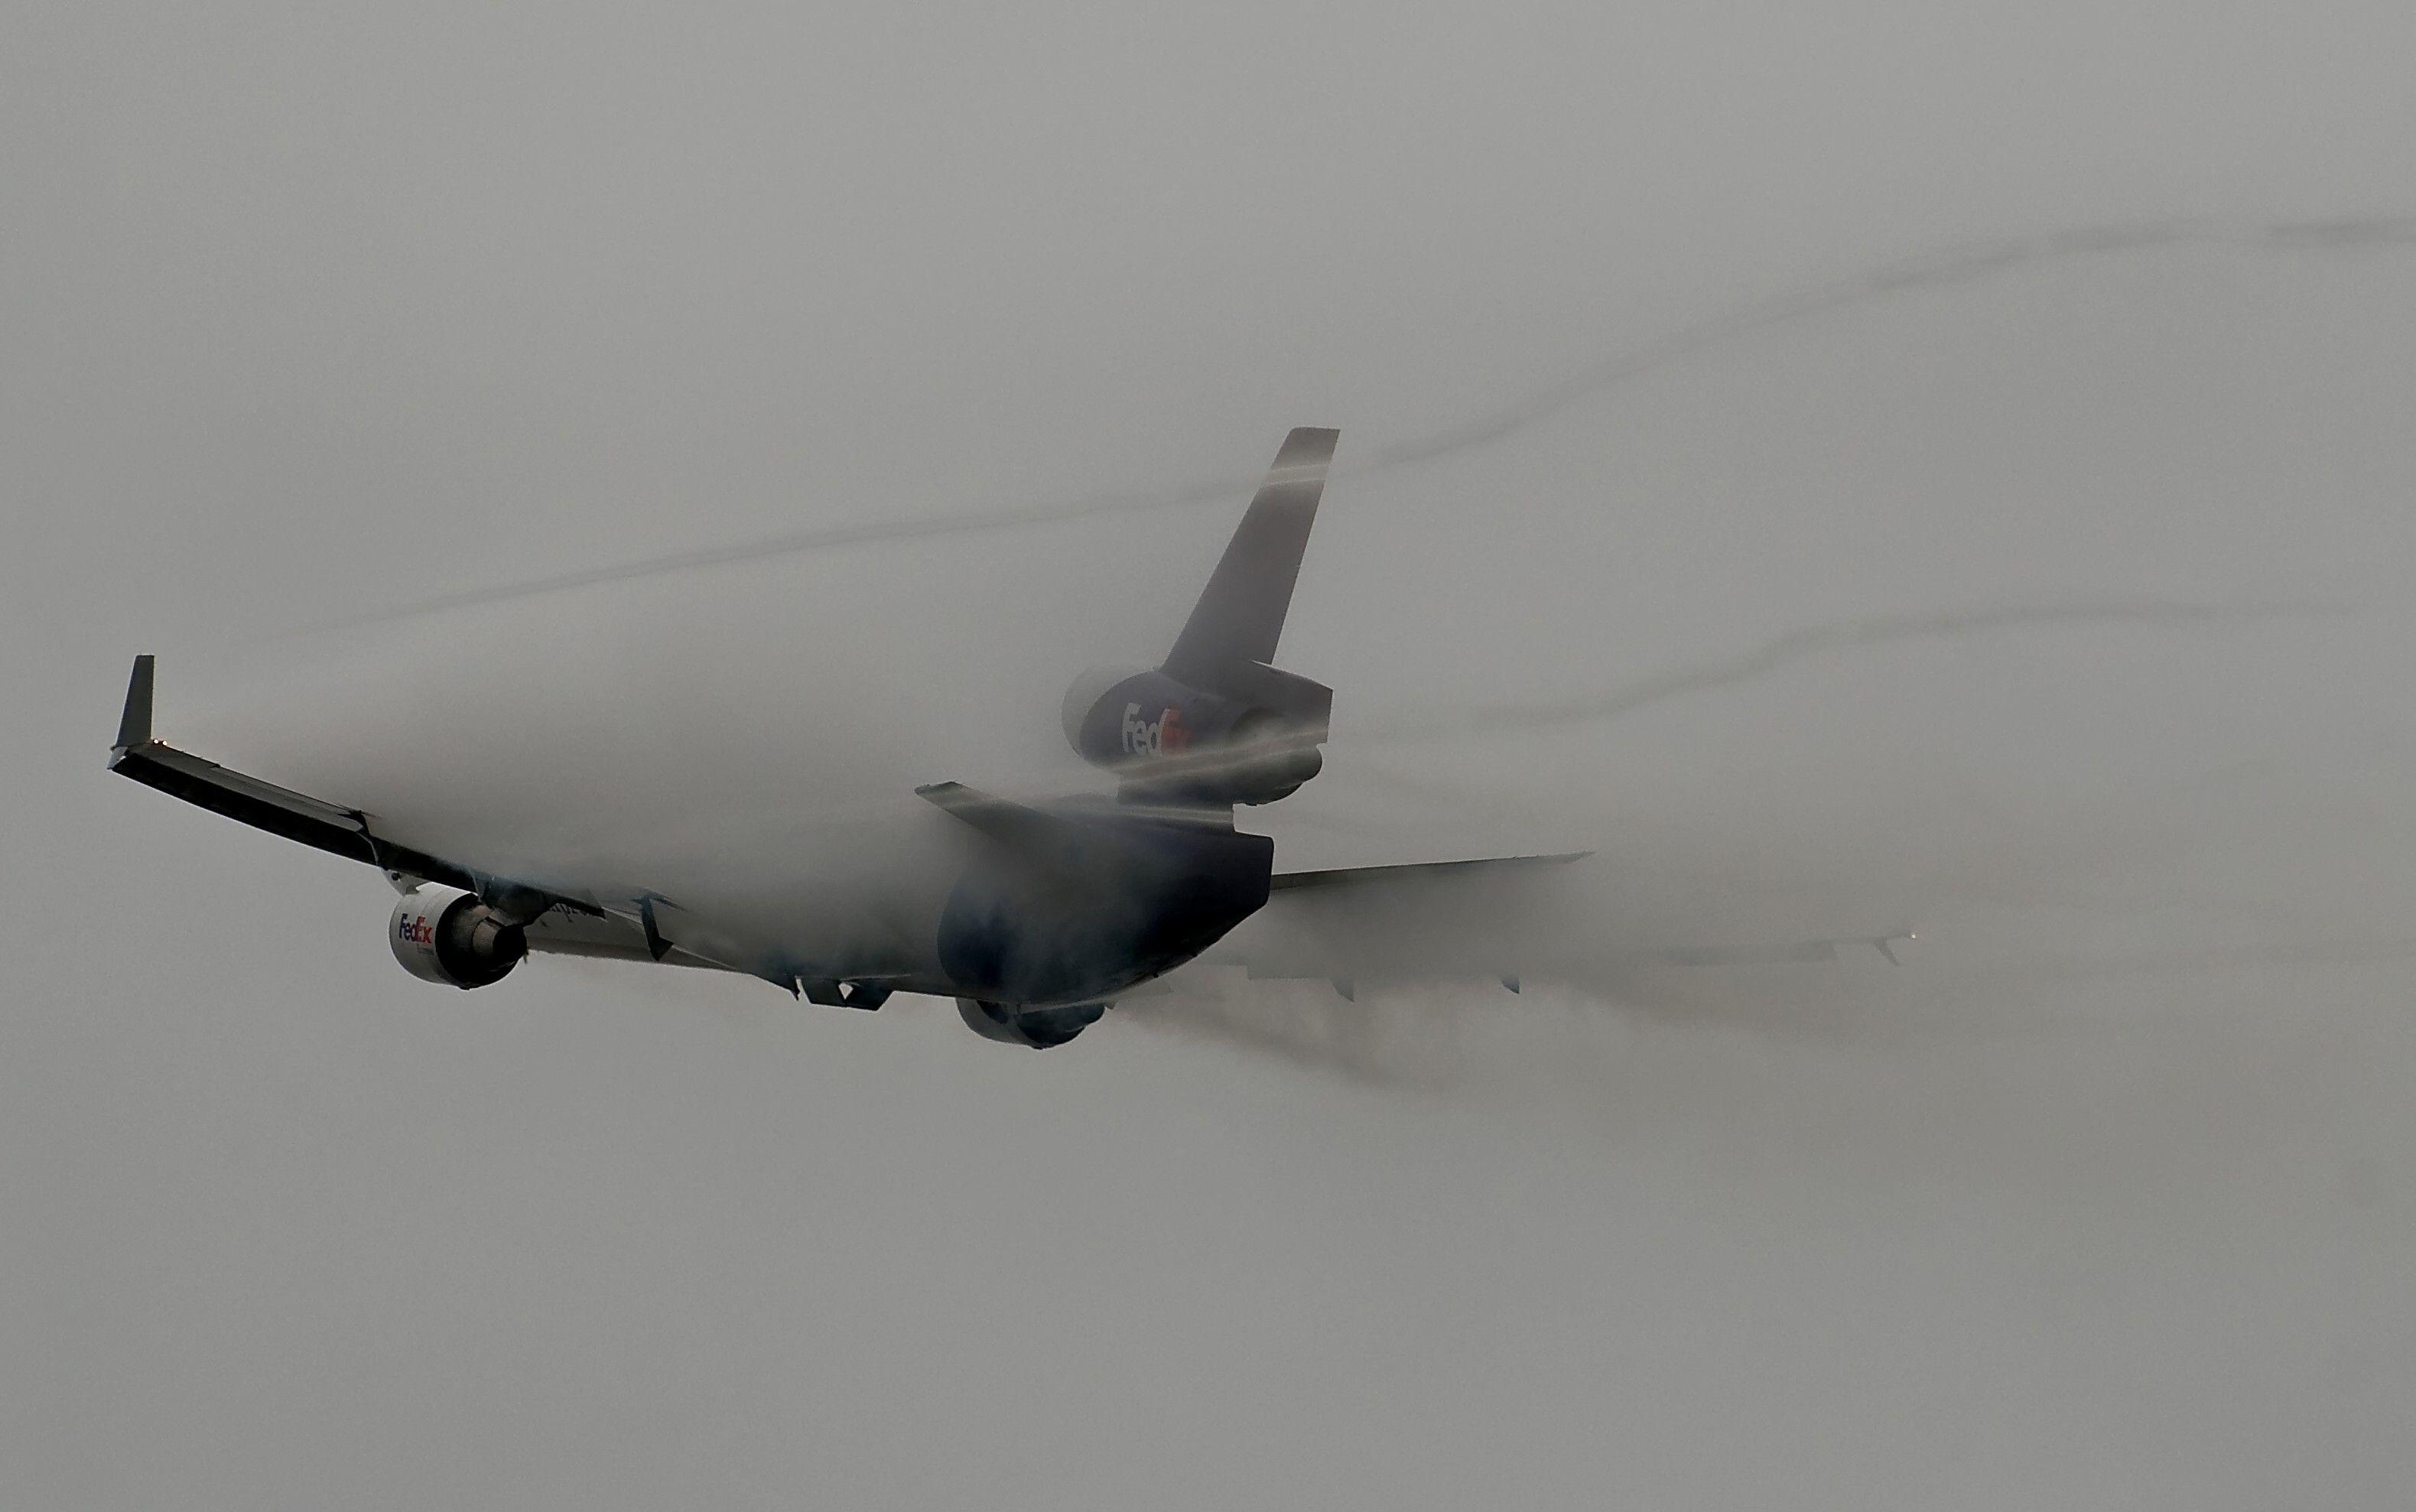 FedEx jet creating vapor on take off Jet, Vapor, Aircraft